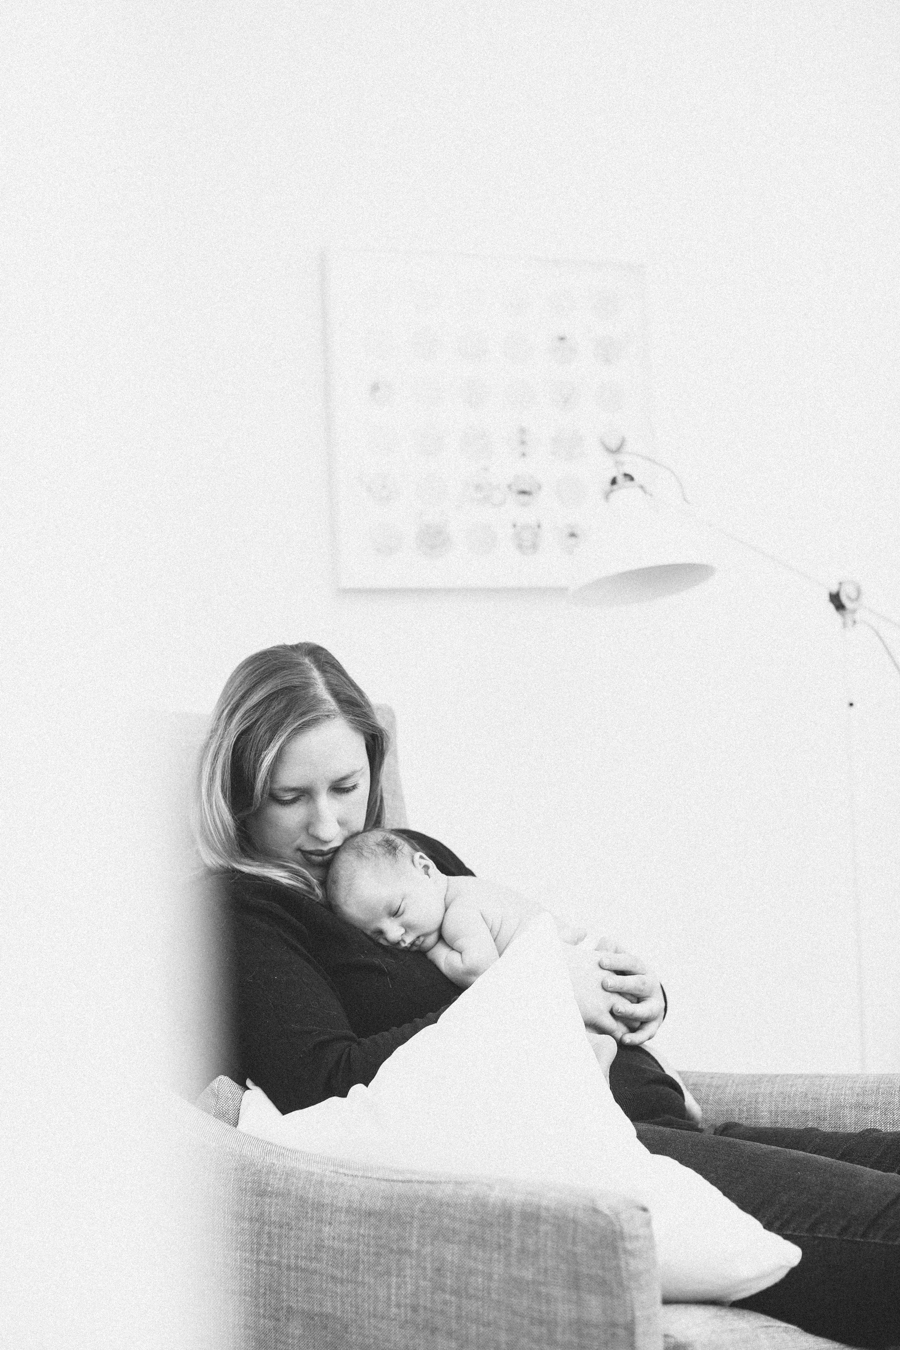 Frankee_Newborn_Blog-1-4-1.jpg